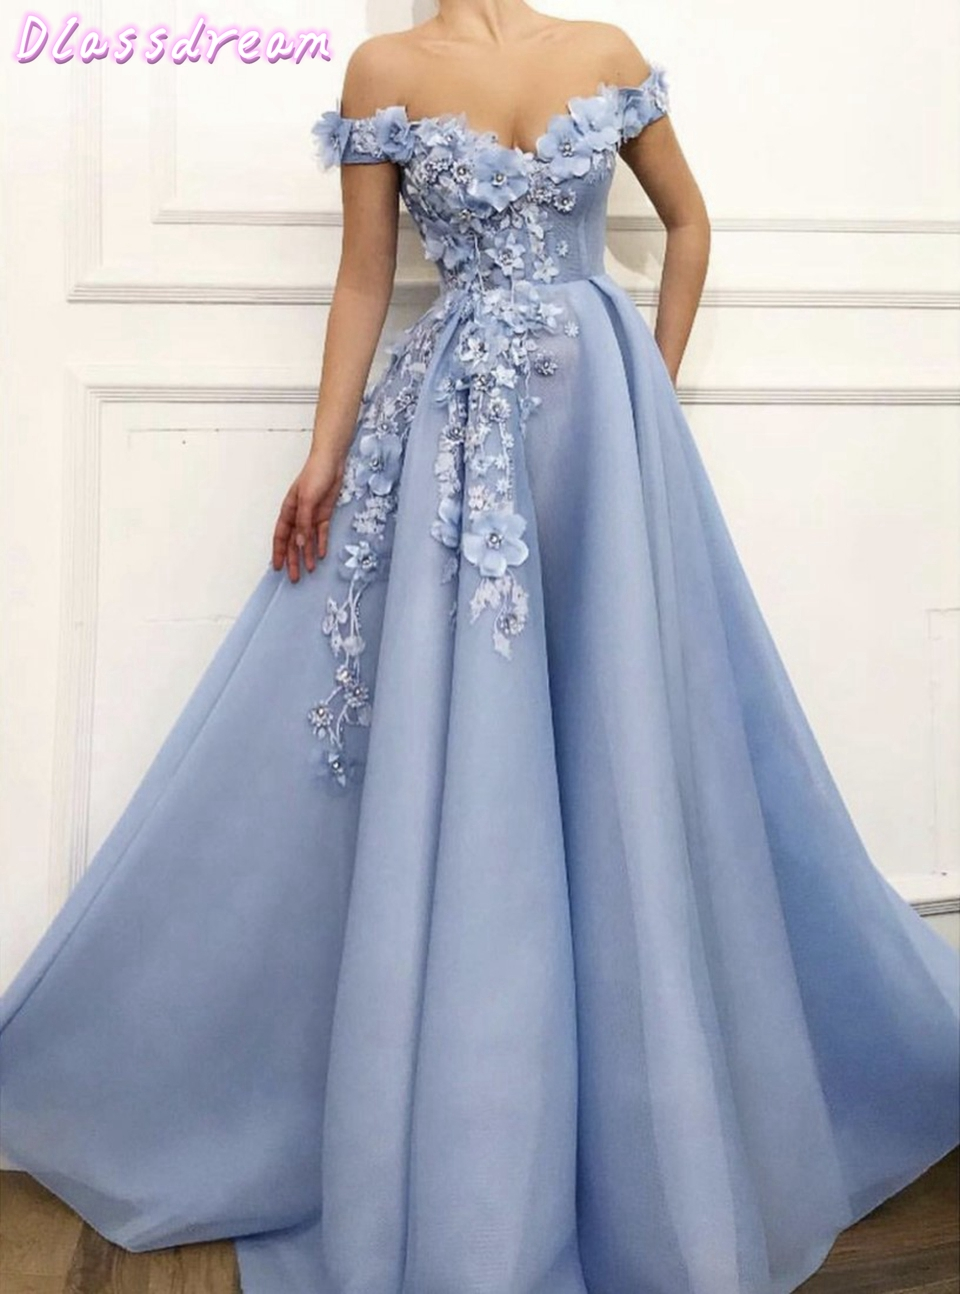 Off Shoulder Tulle Prom Dresses 2020 Women Formal Party Night Long Vestidos De Gala Light Blue Appliqus Elegant Evening Gowns